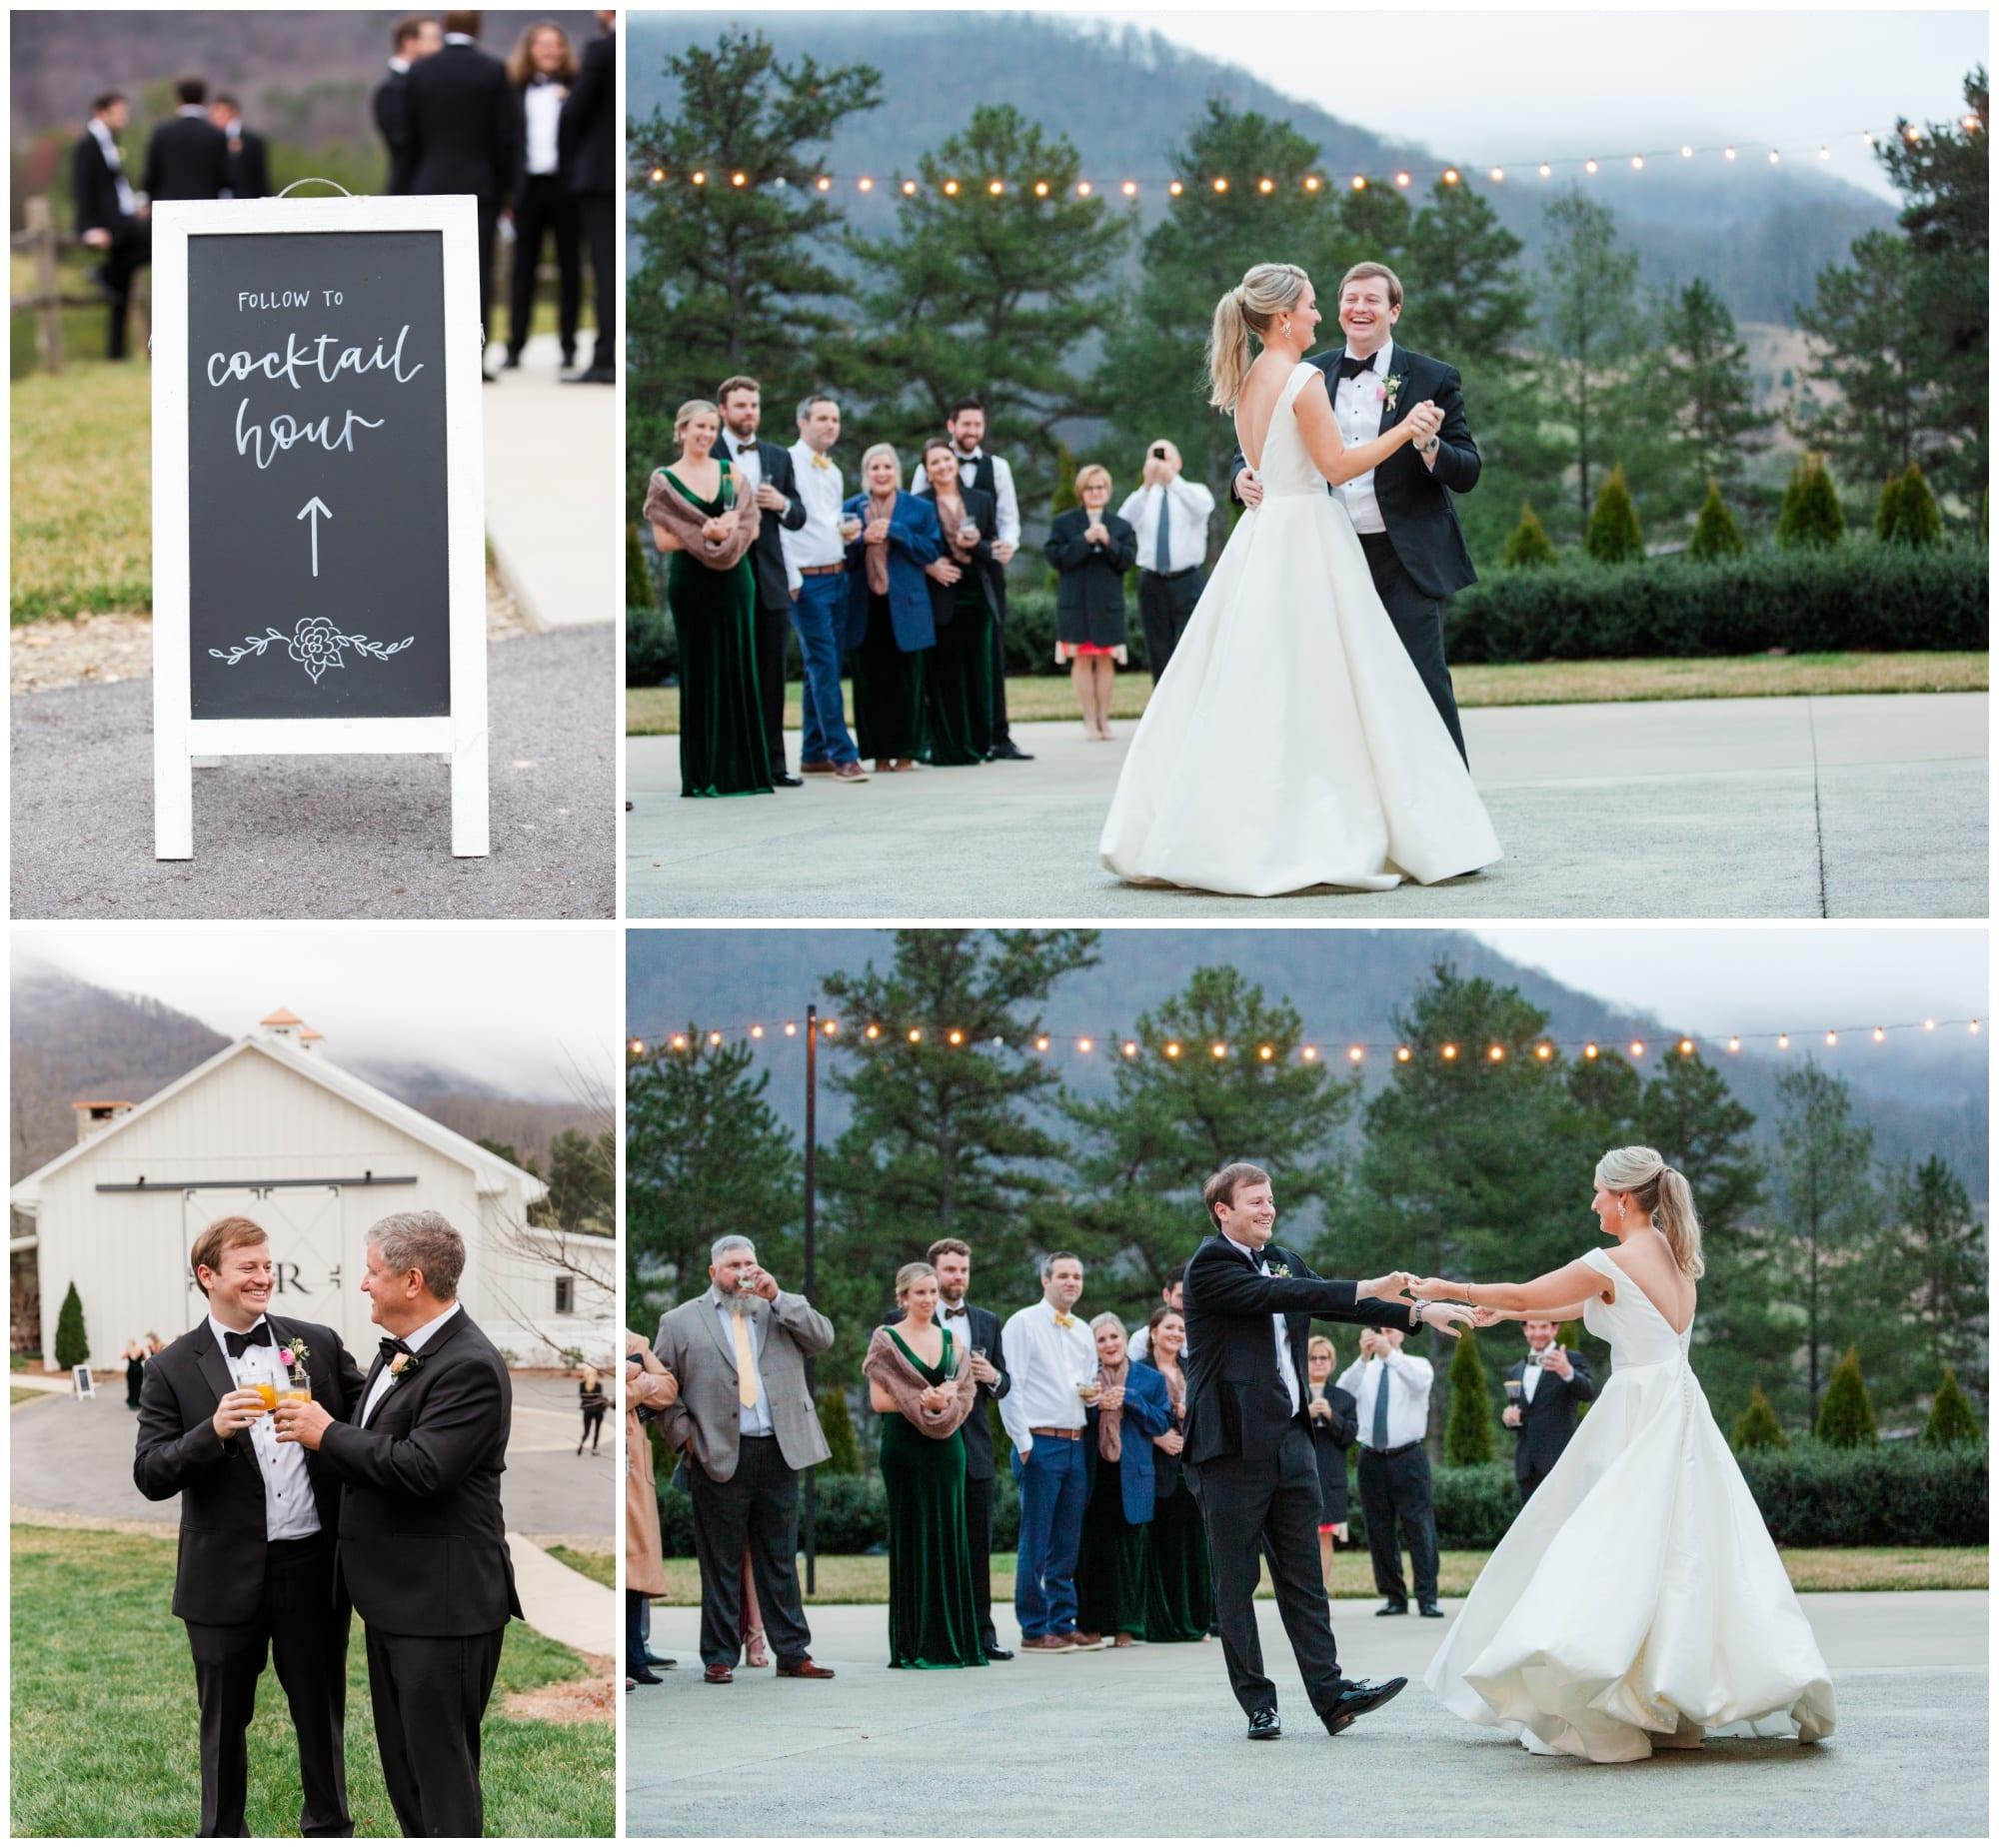 First dance at blue hour - Chestnut Ridge Wedding Venue